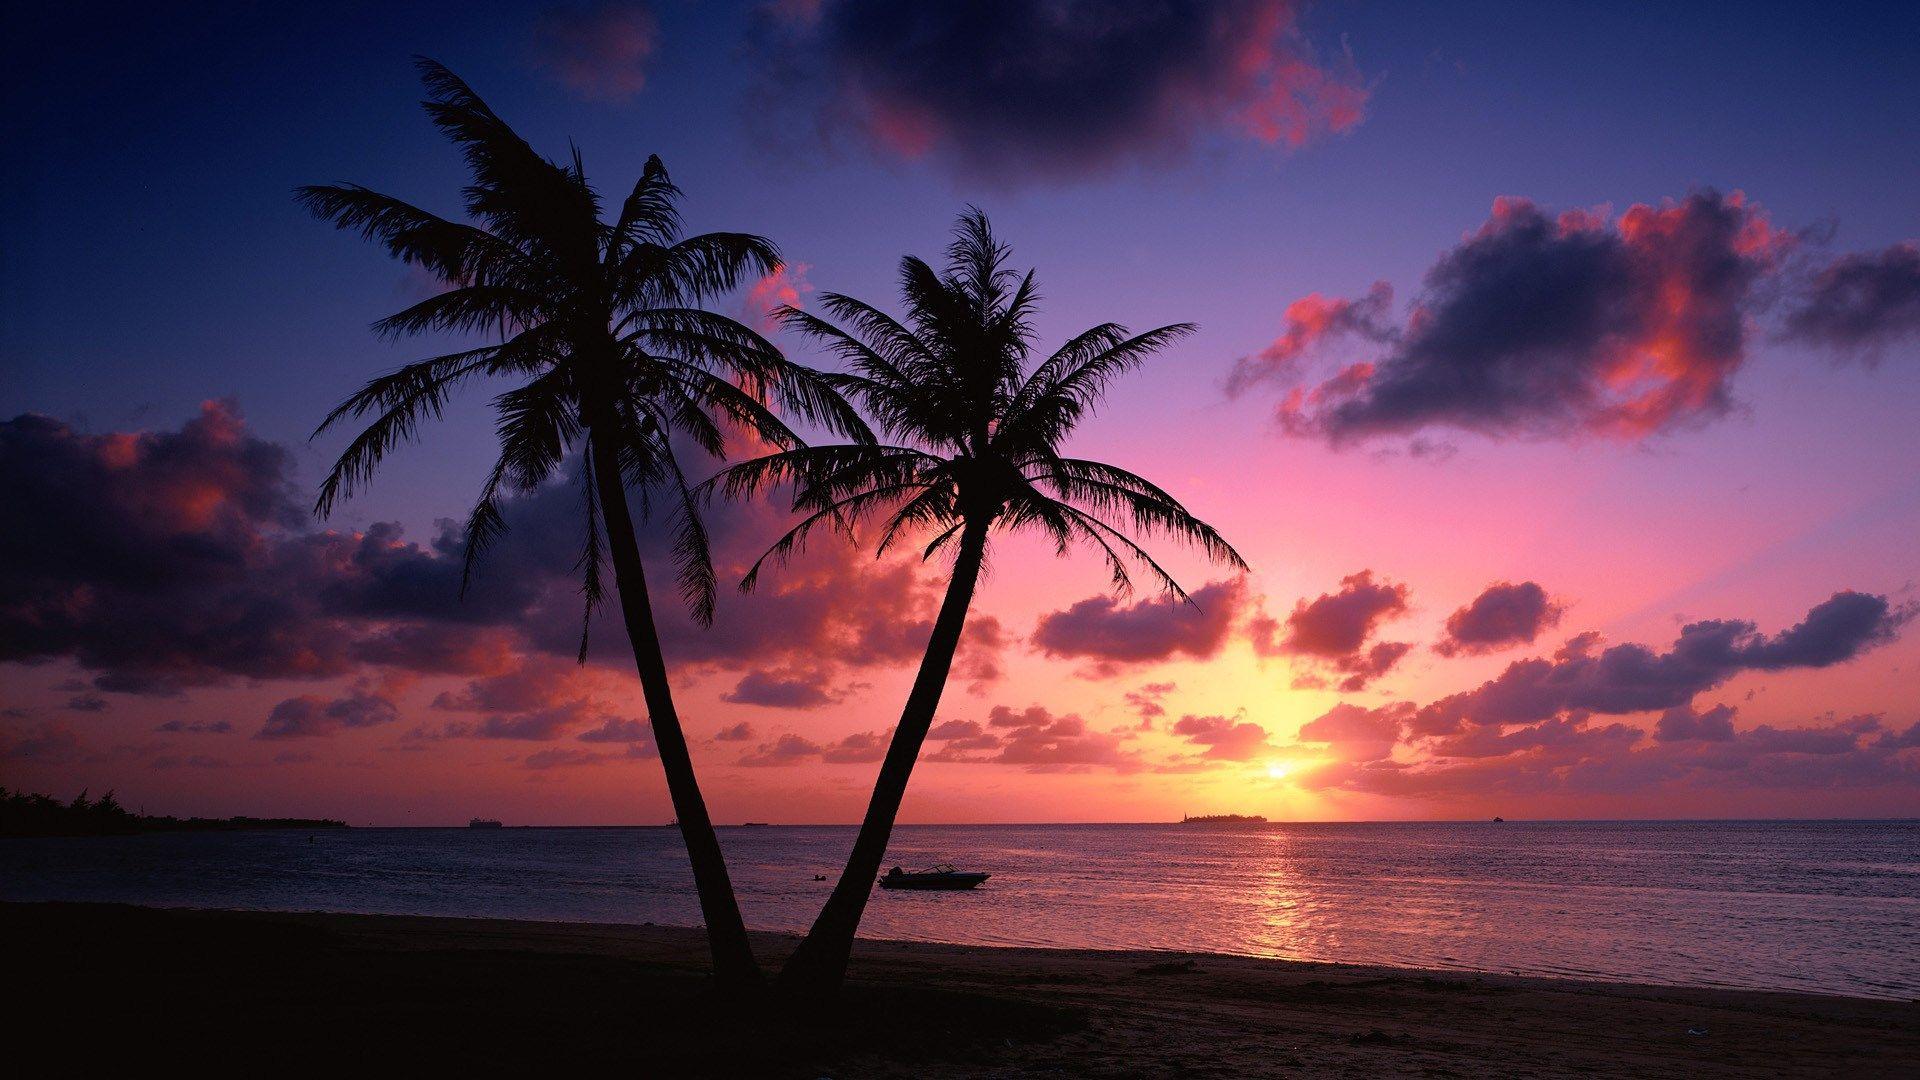 Sunset Desktop Wallpaper Pictures Free Beach Sunset Wallpaper Sunset Landscape Sunset Wallpaper